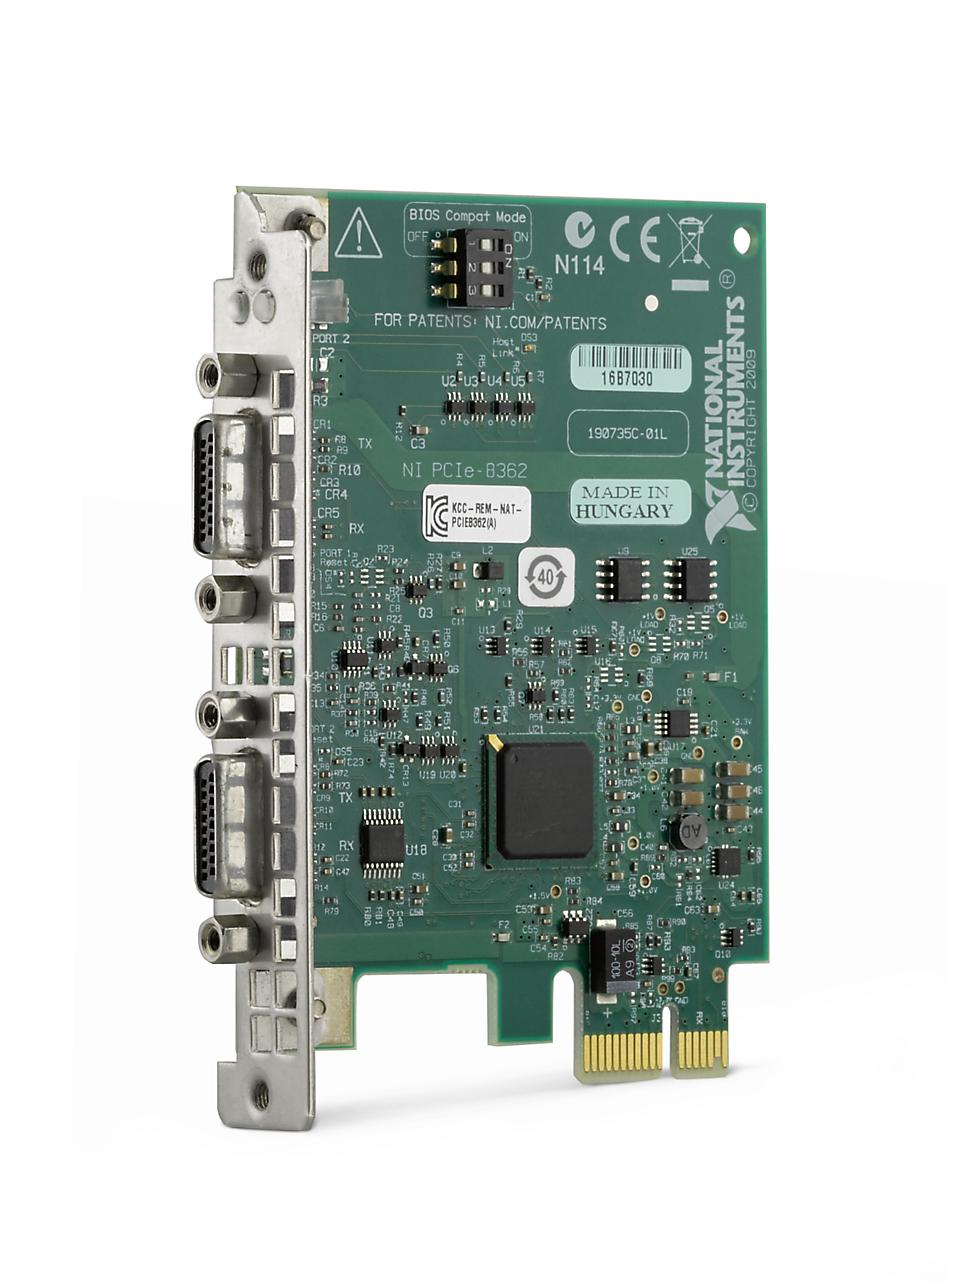 PCIe-8362